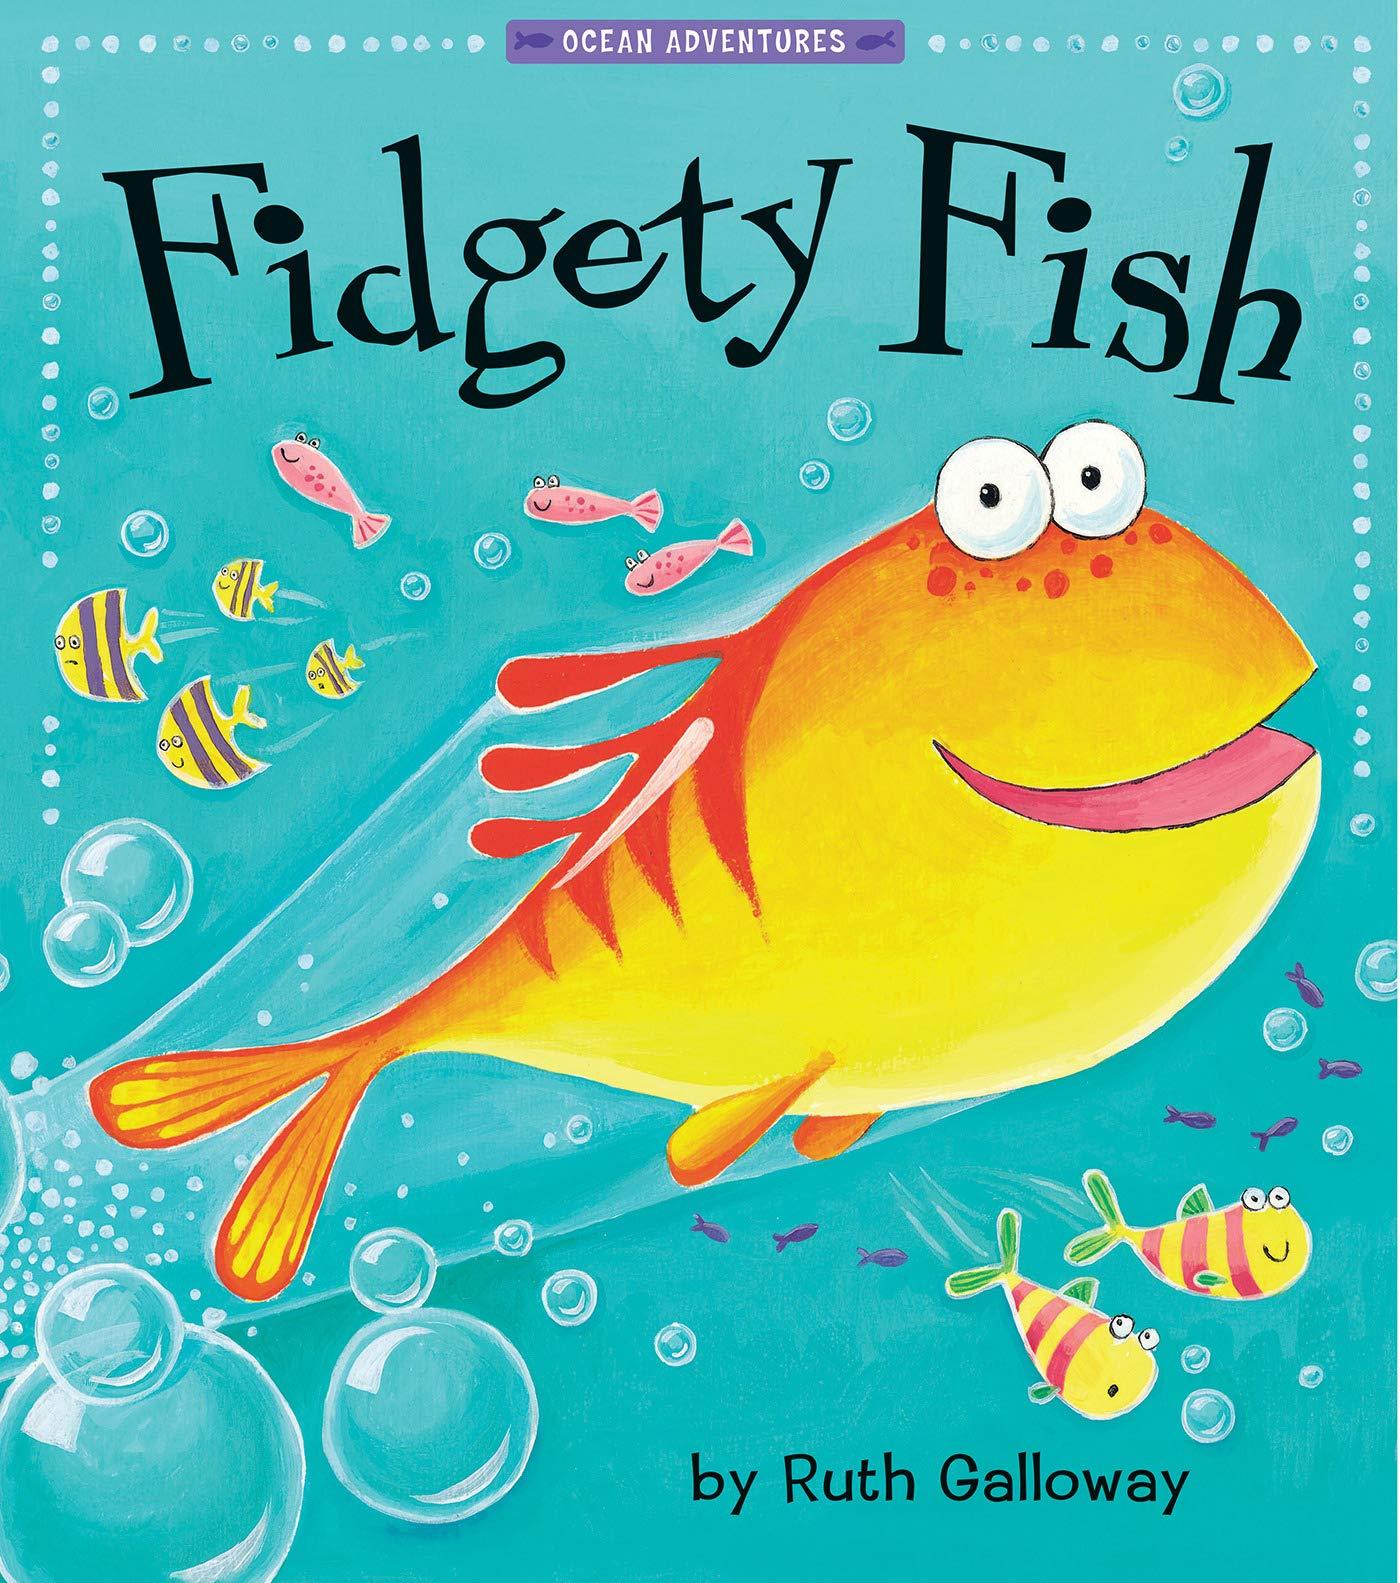 Fidgety Fish (Ocean Adventures): Ruth Galloway: 9781680100556 ...